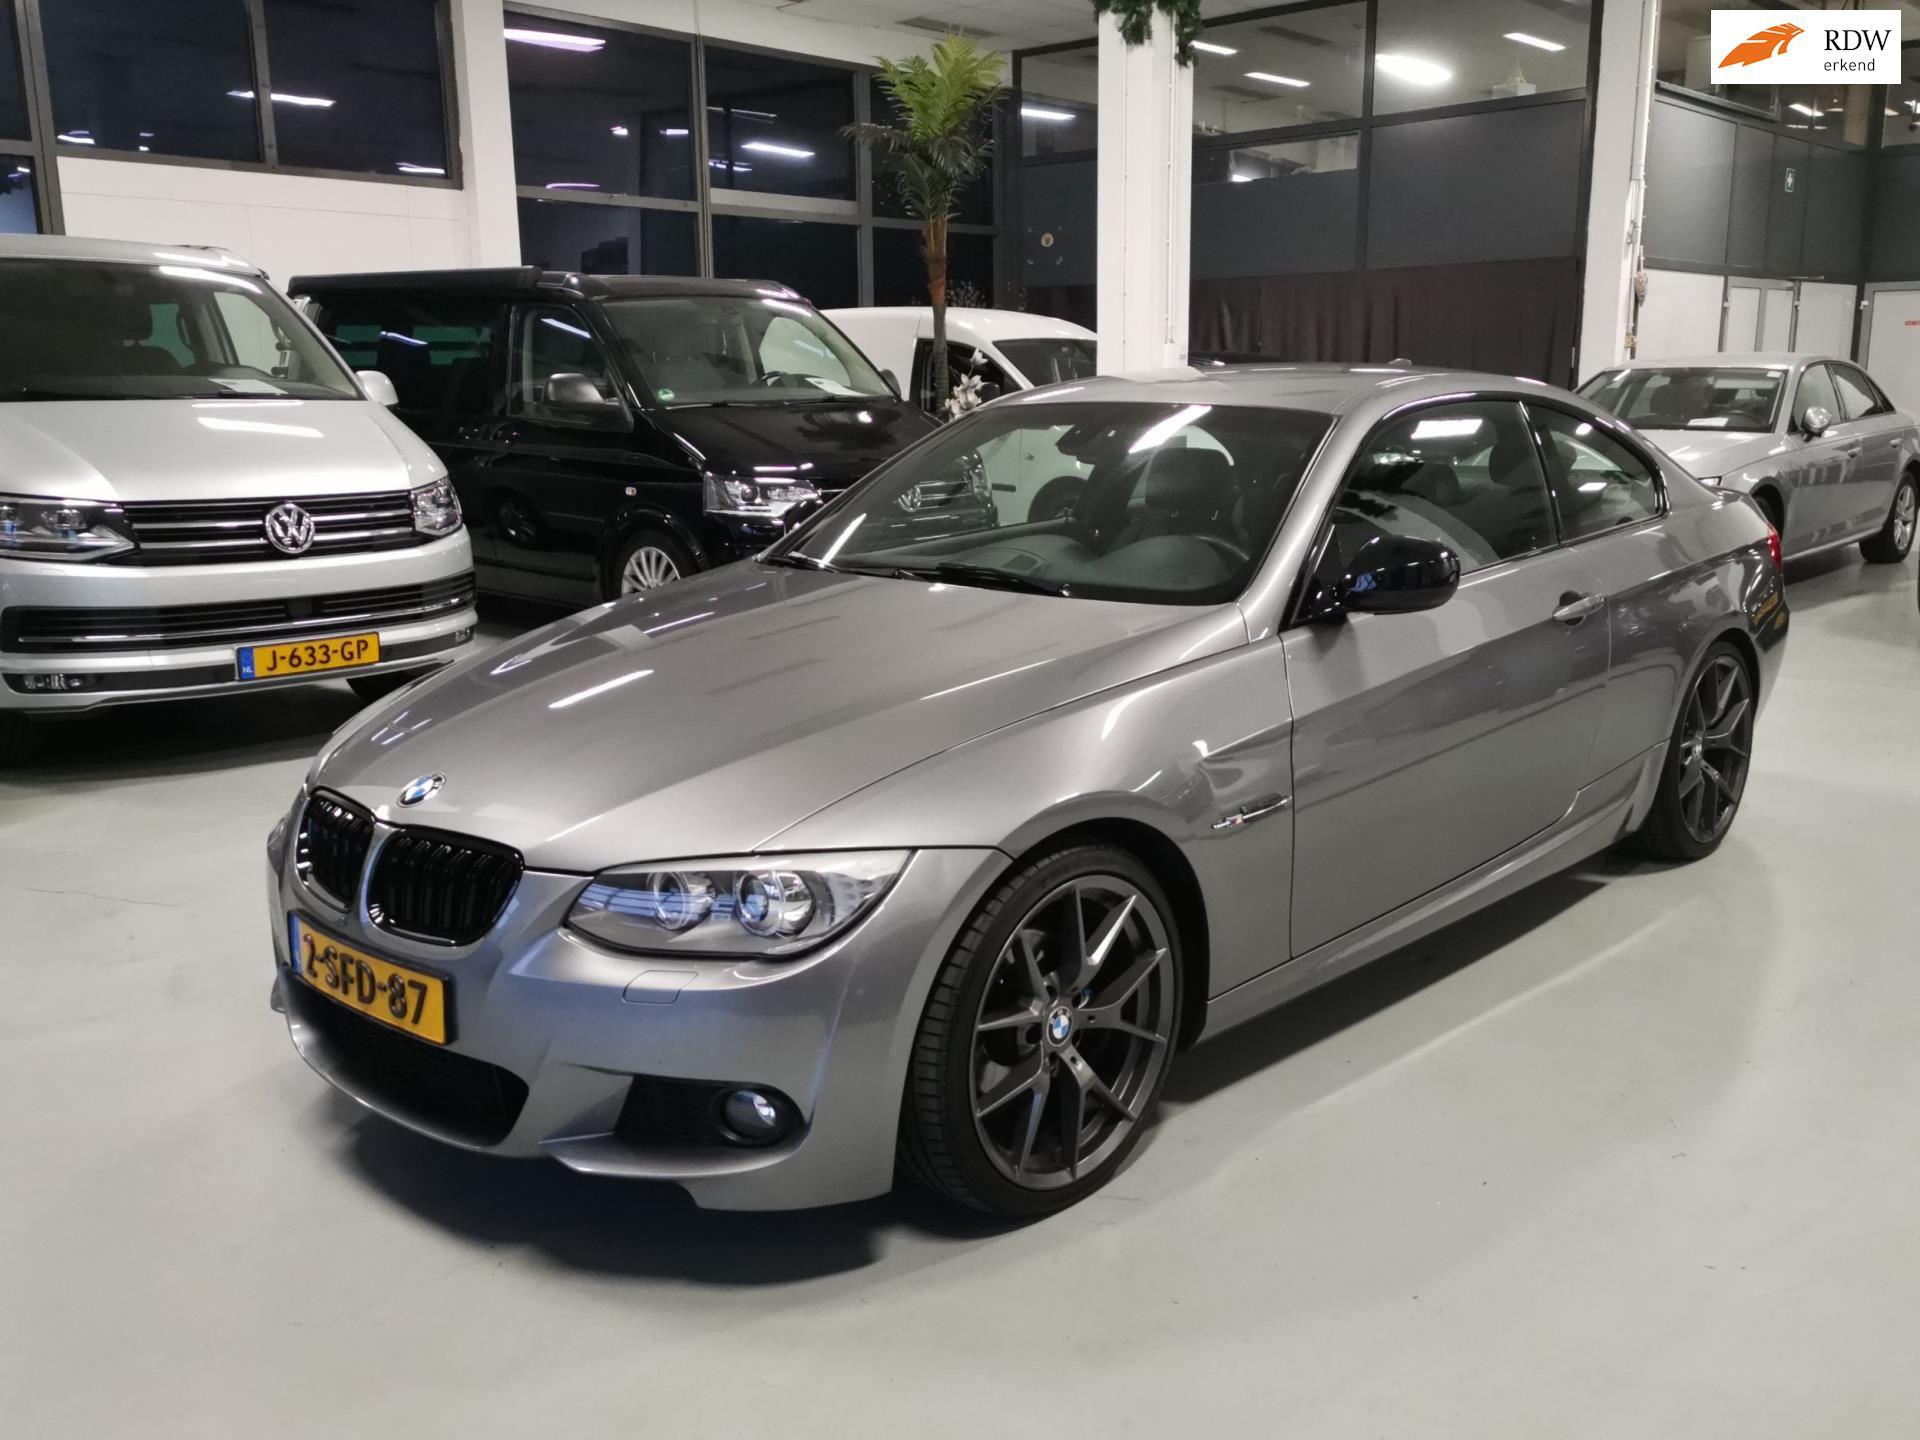 BMW 3-serie Coupé occasion - Auto Square